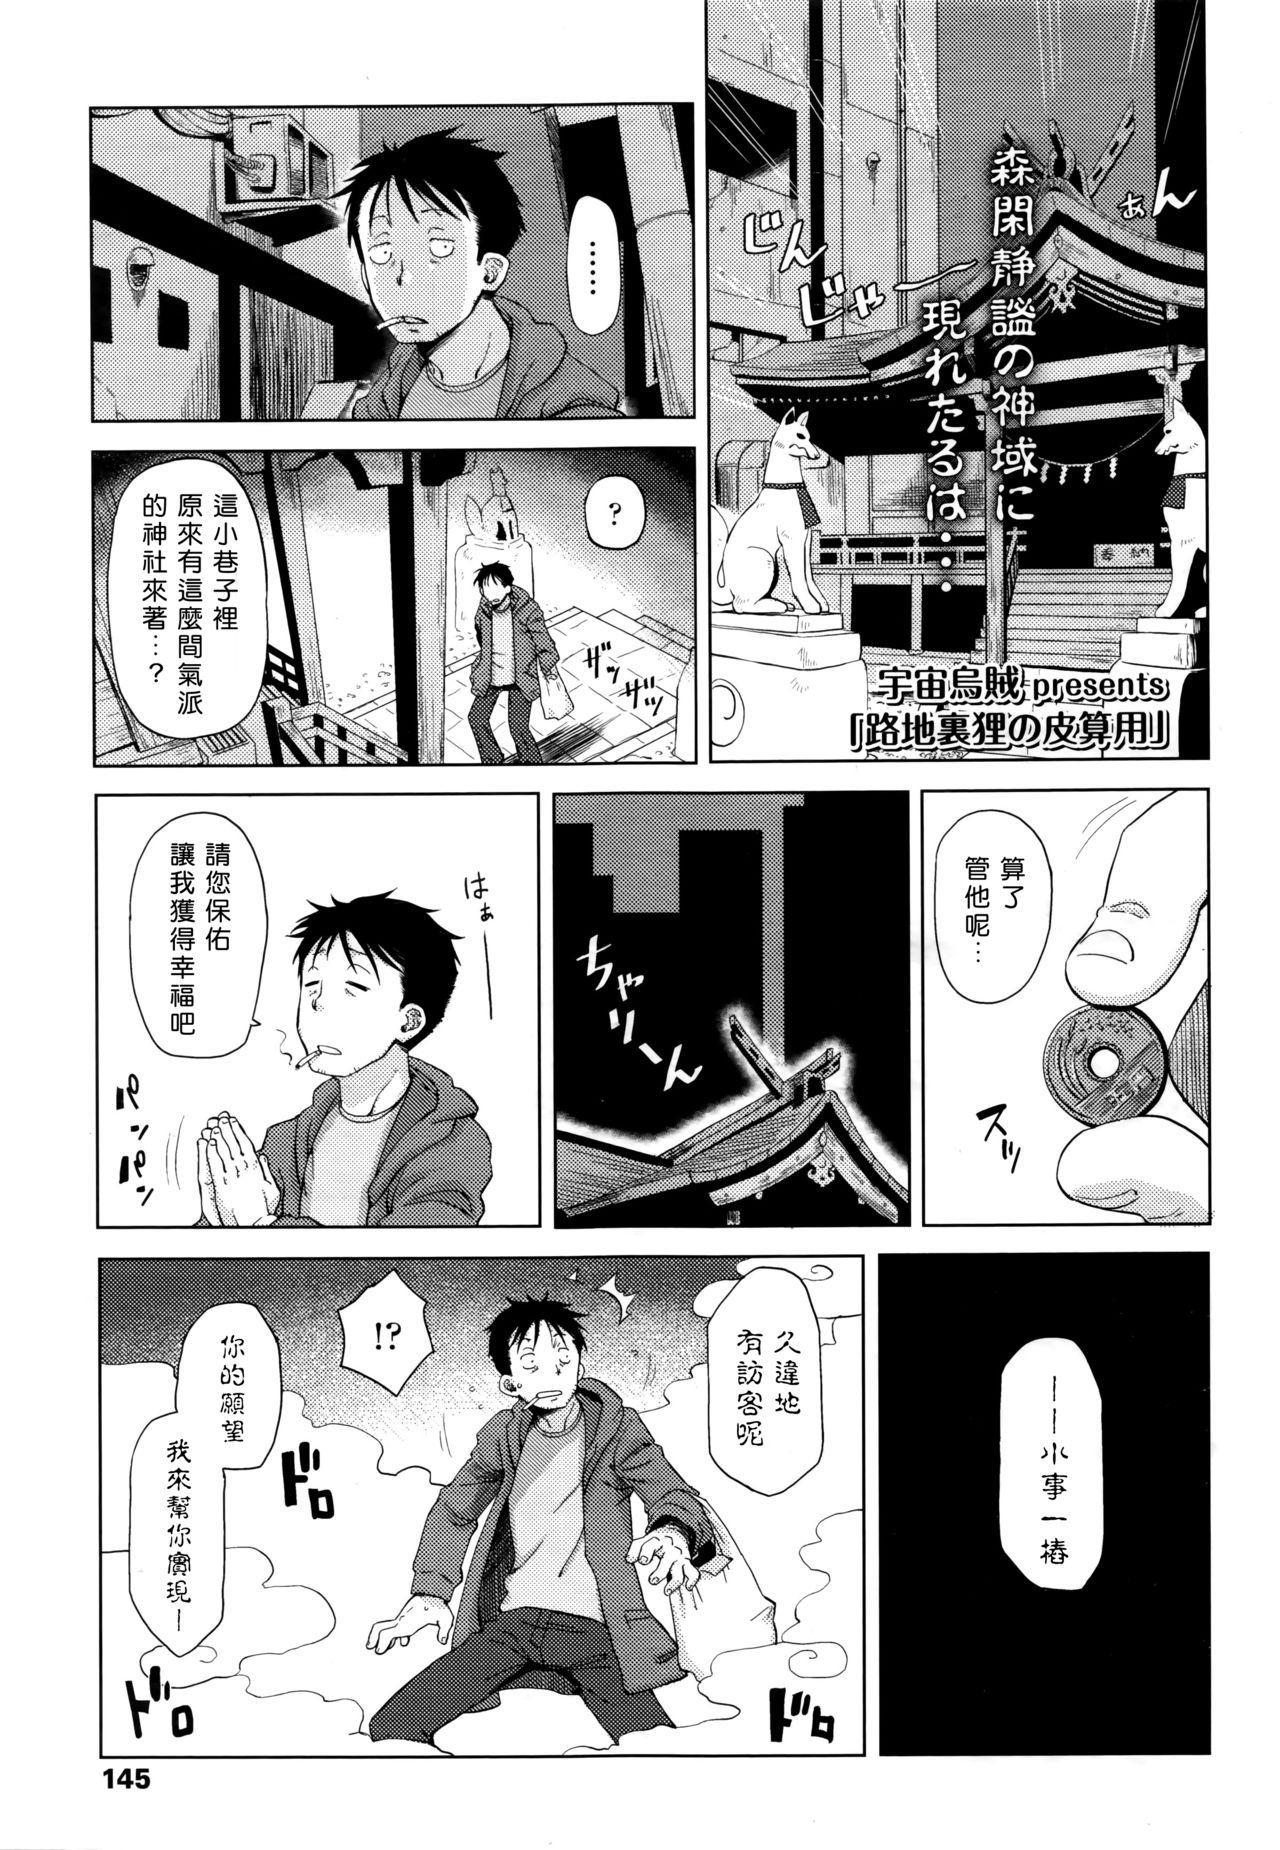 Rojiura Tanuki no Kawazanyou 0